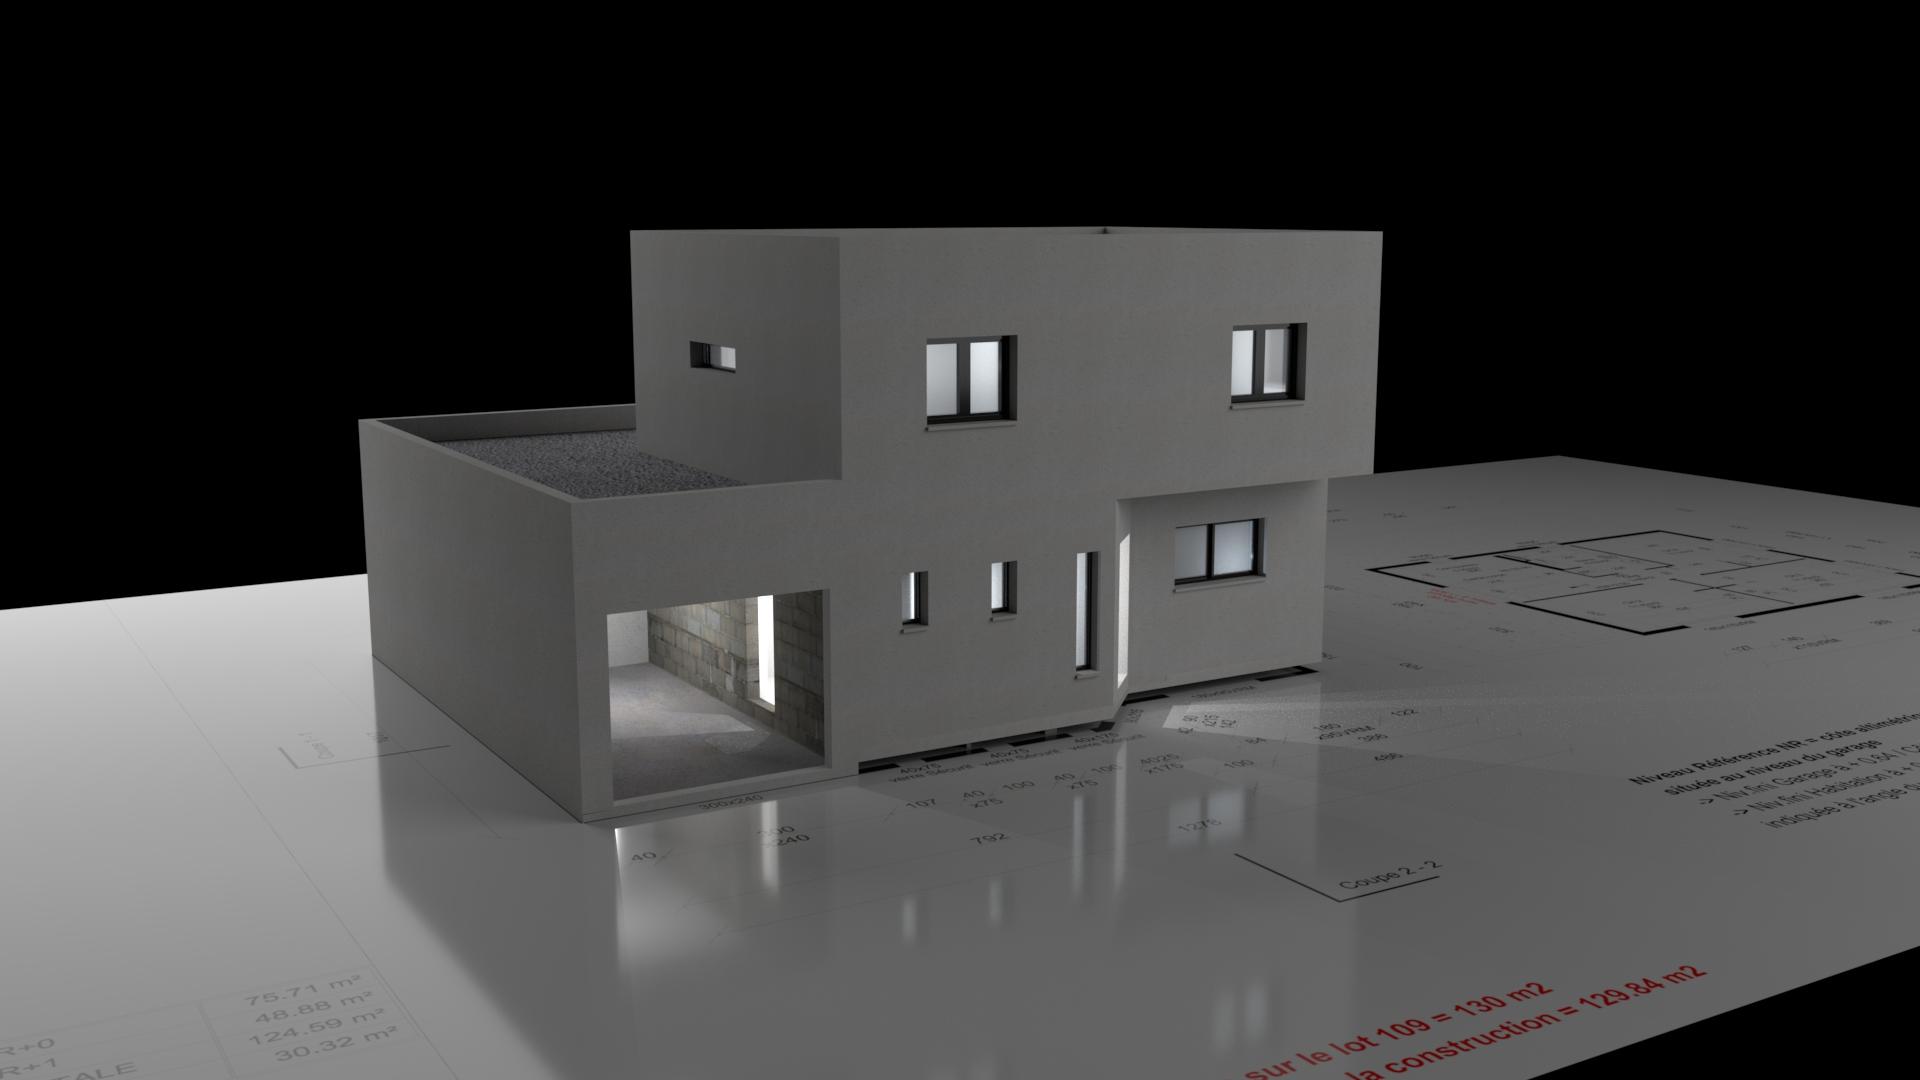 modelisation-3d-realite-virtuelle-montpellier-d-light-production-plan5